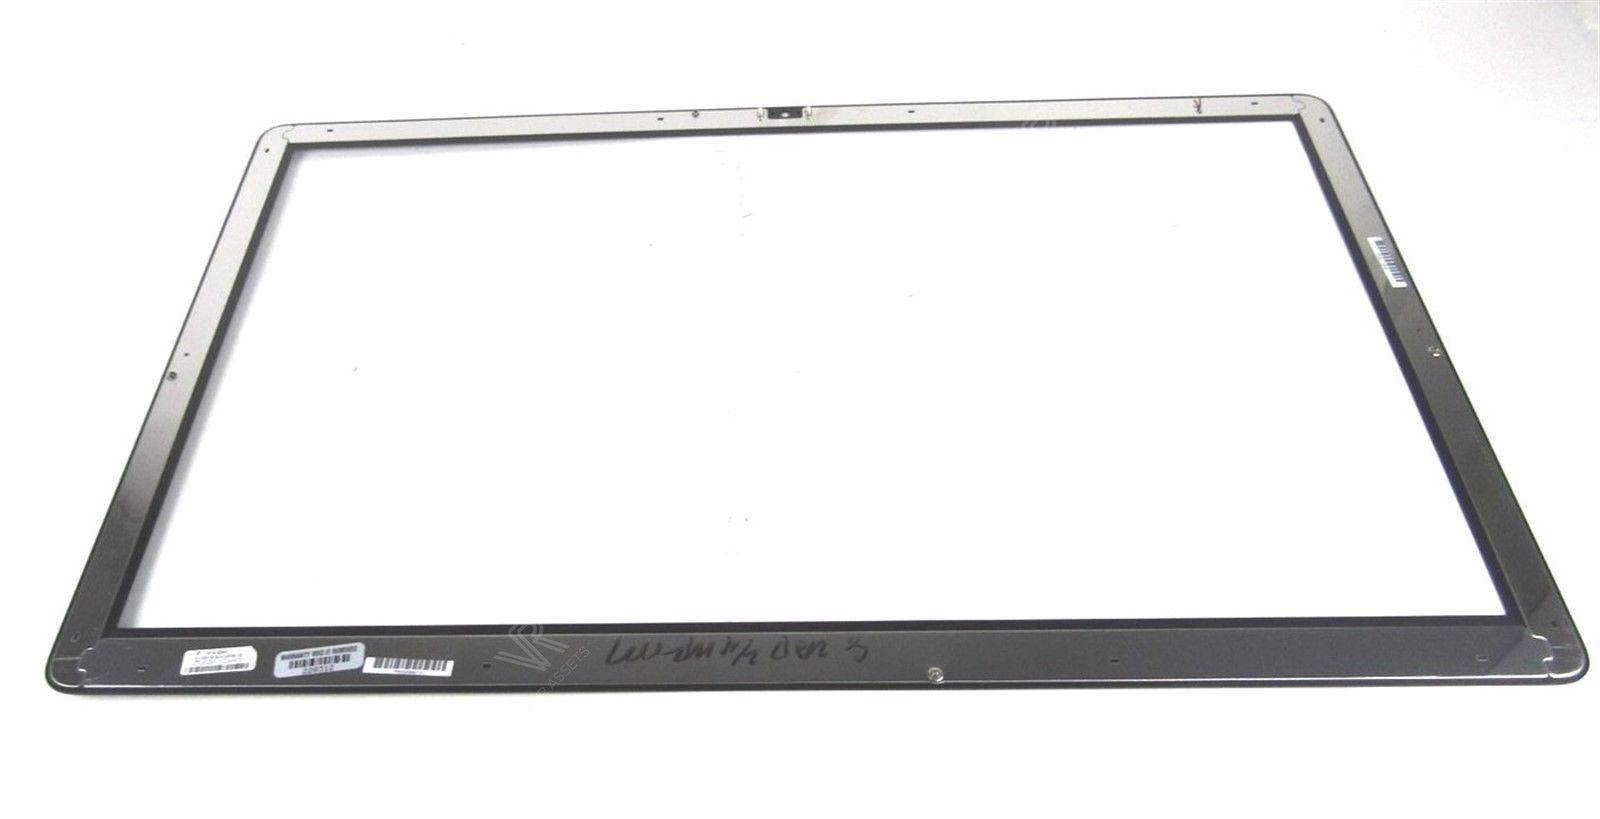 Apple Thunderbolt Display 27''A1407 EMC 2432 Glass Panel Cover 816-0242